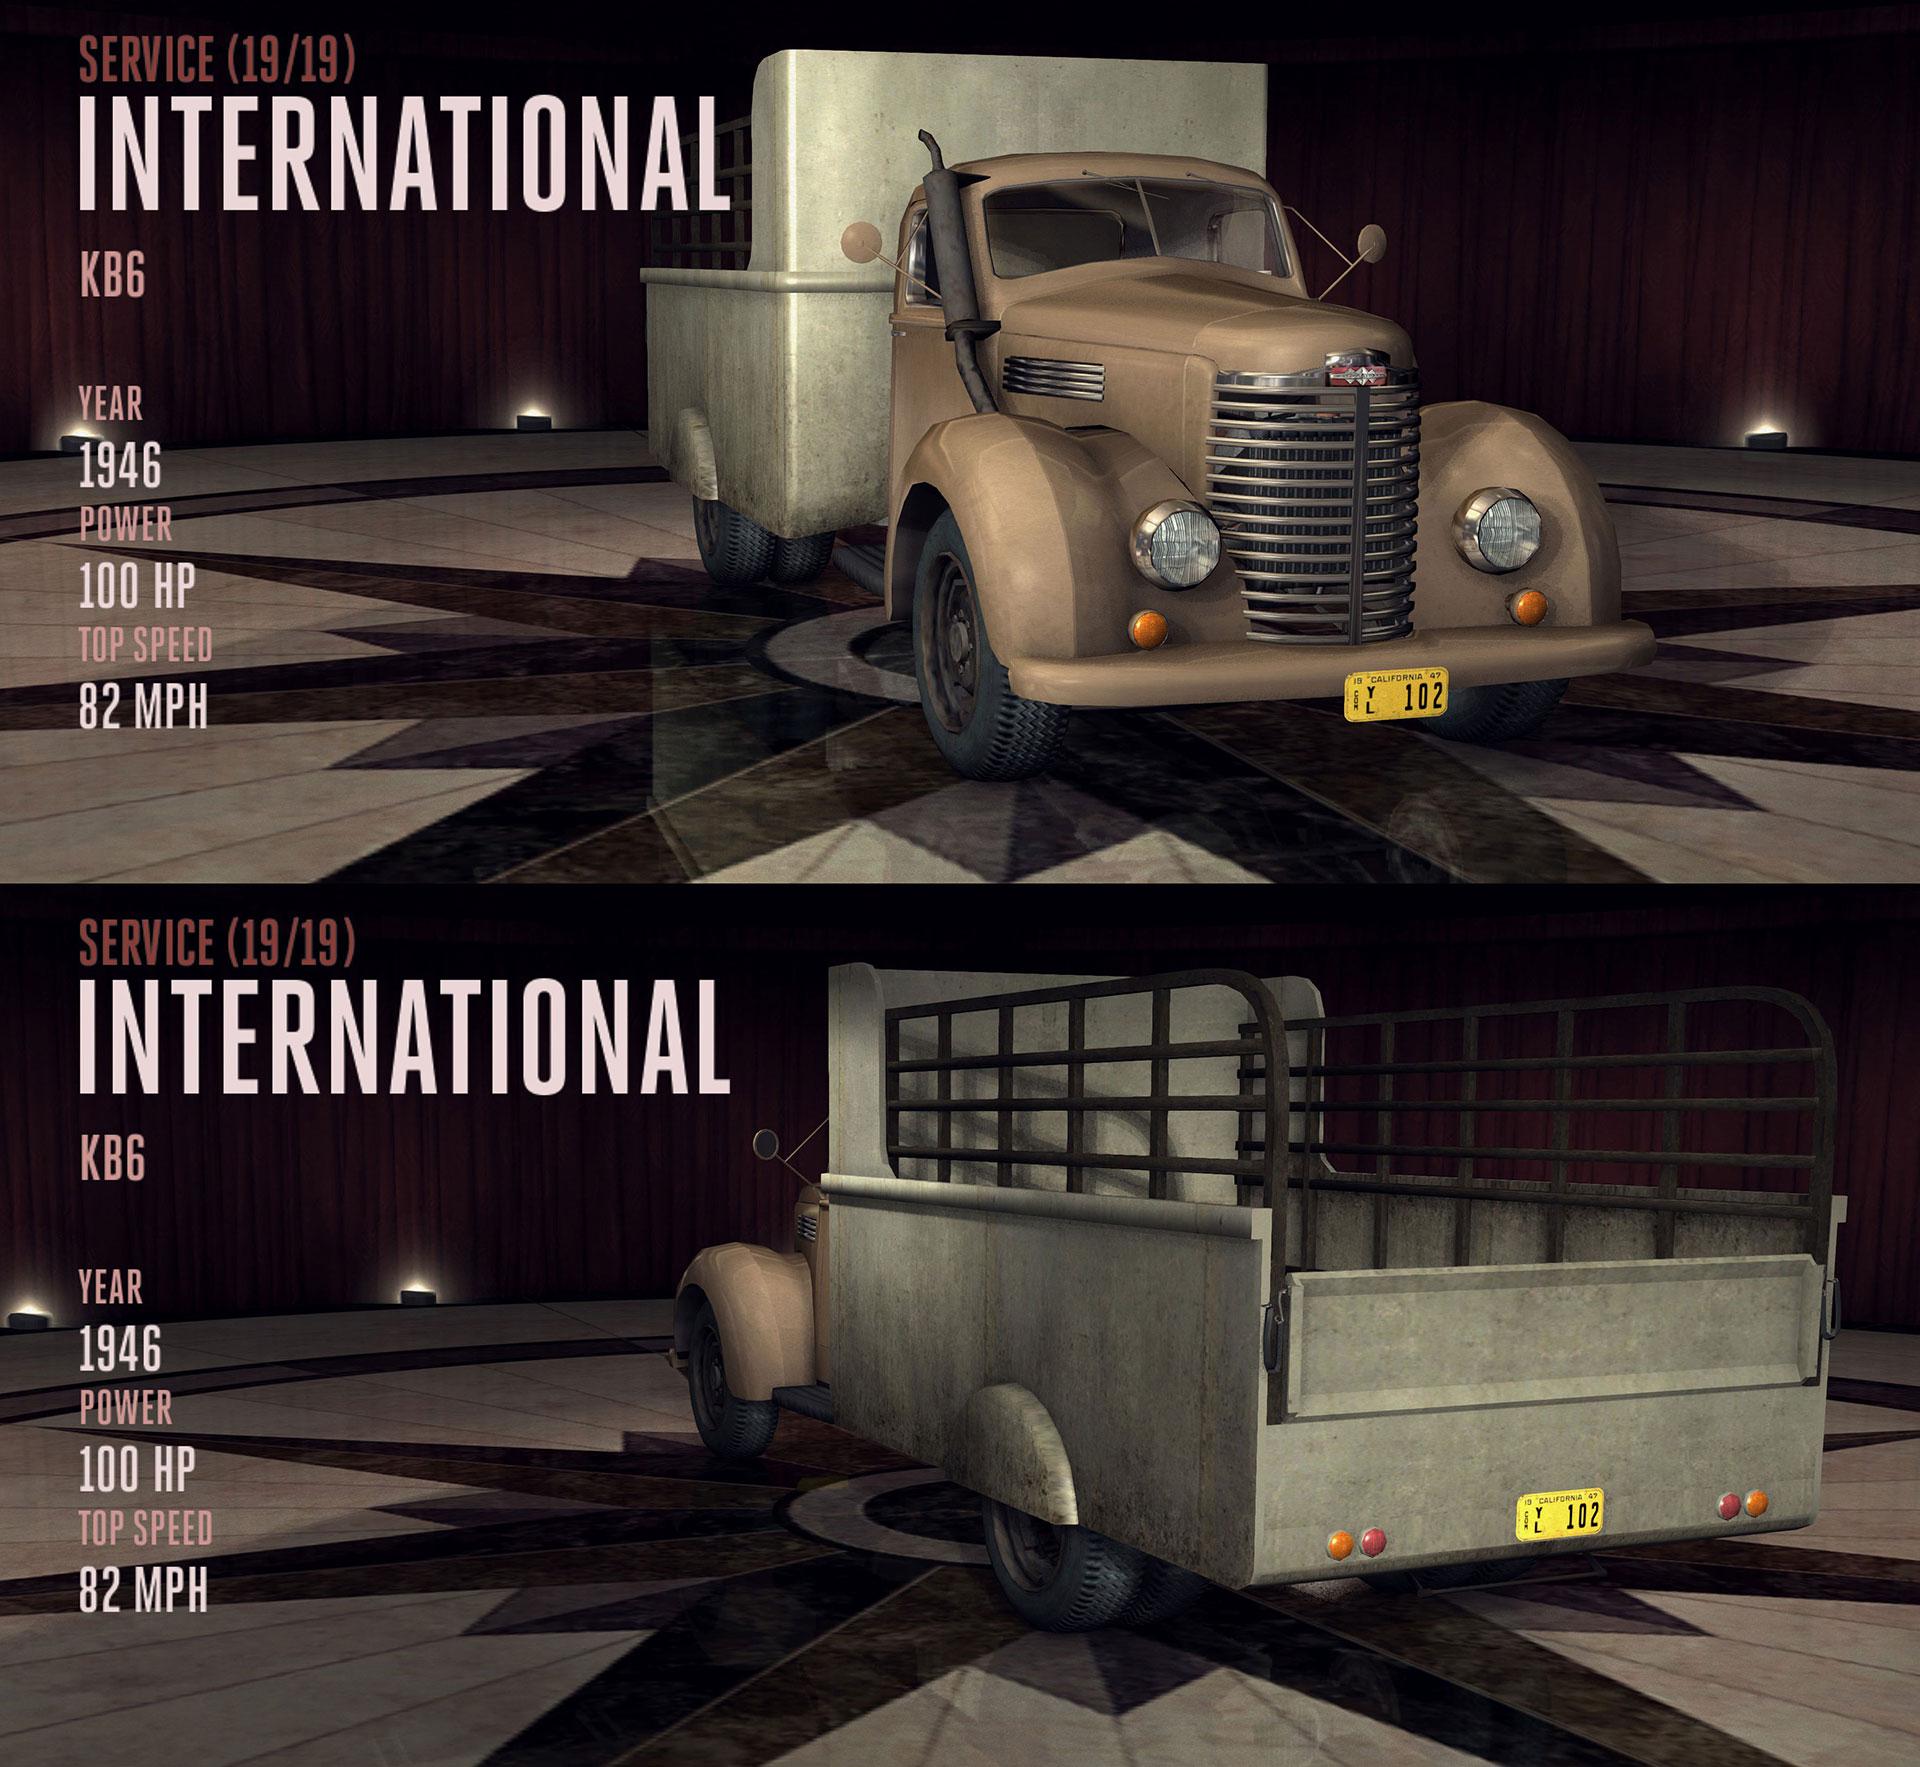 Archivo:1946-international-kb6.jpg